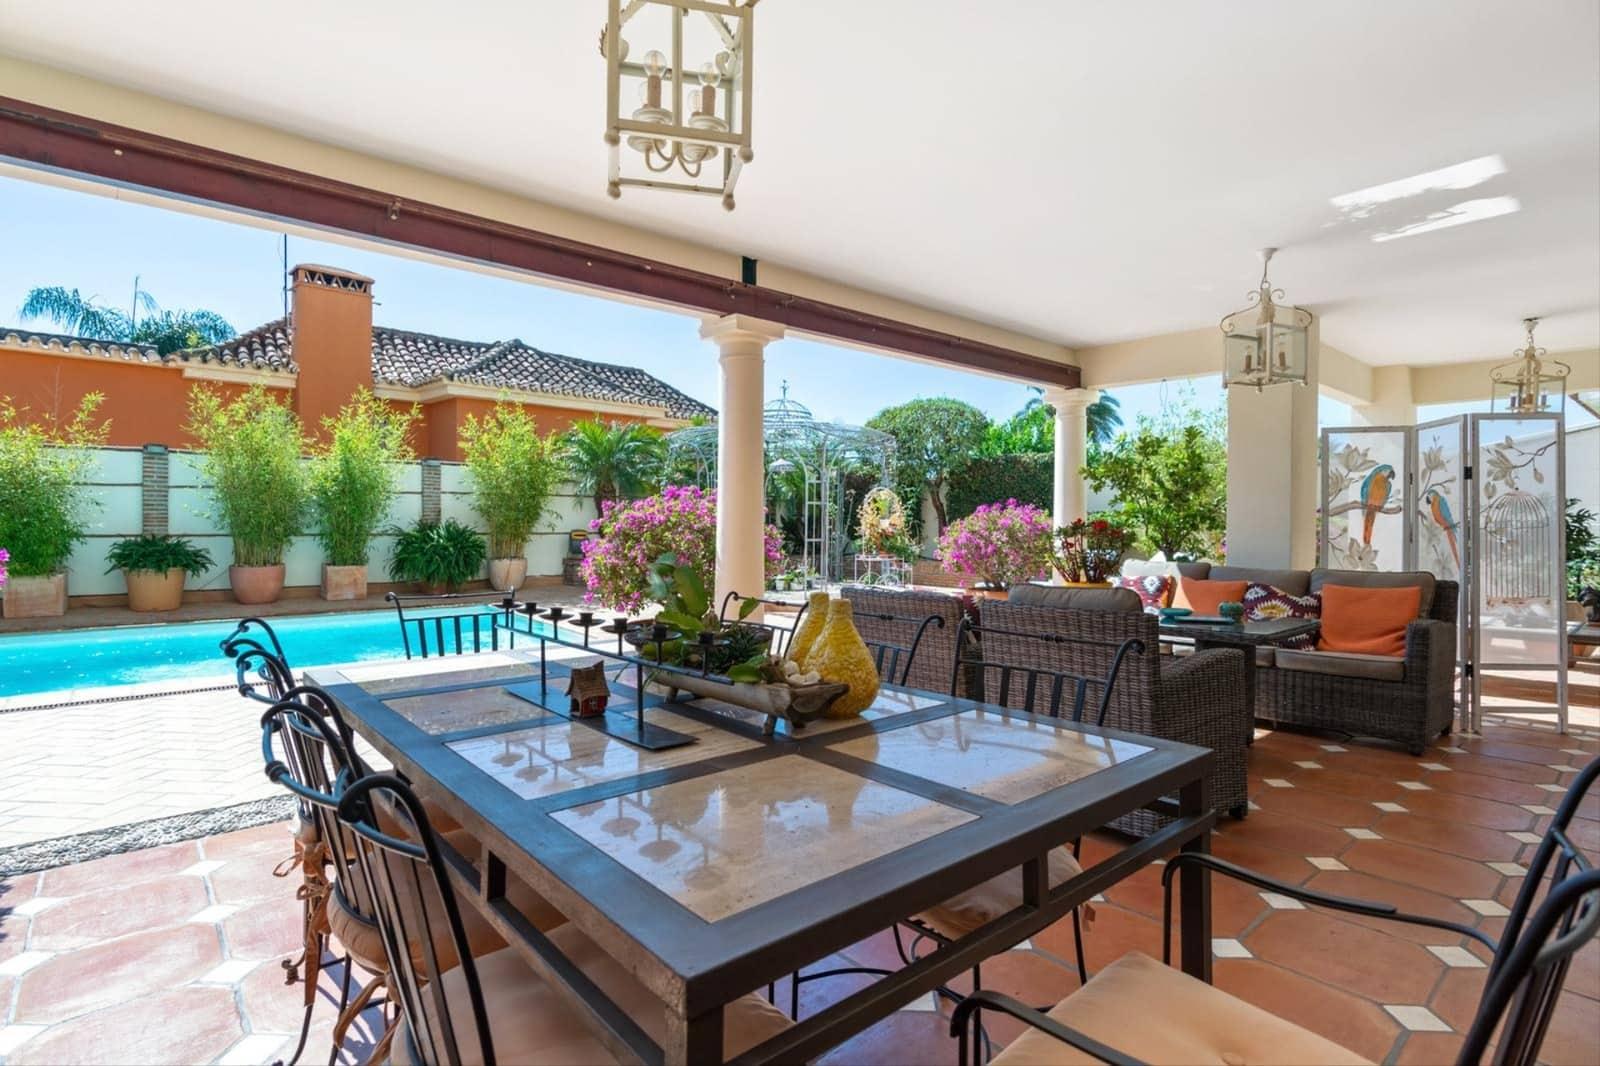 4 bedroom Villa for sale in Marbella with pool garage - € 1,180,000 (Ref: 4456203)